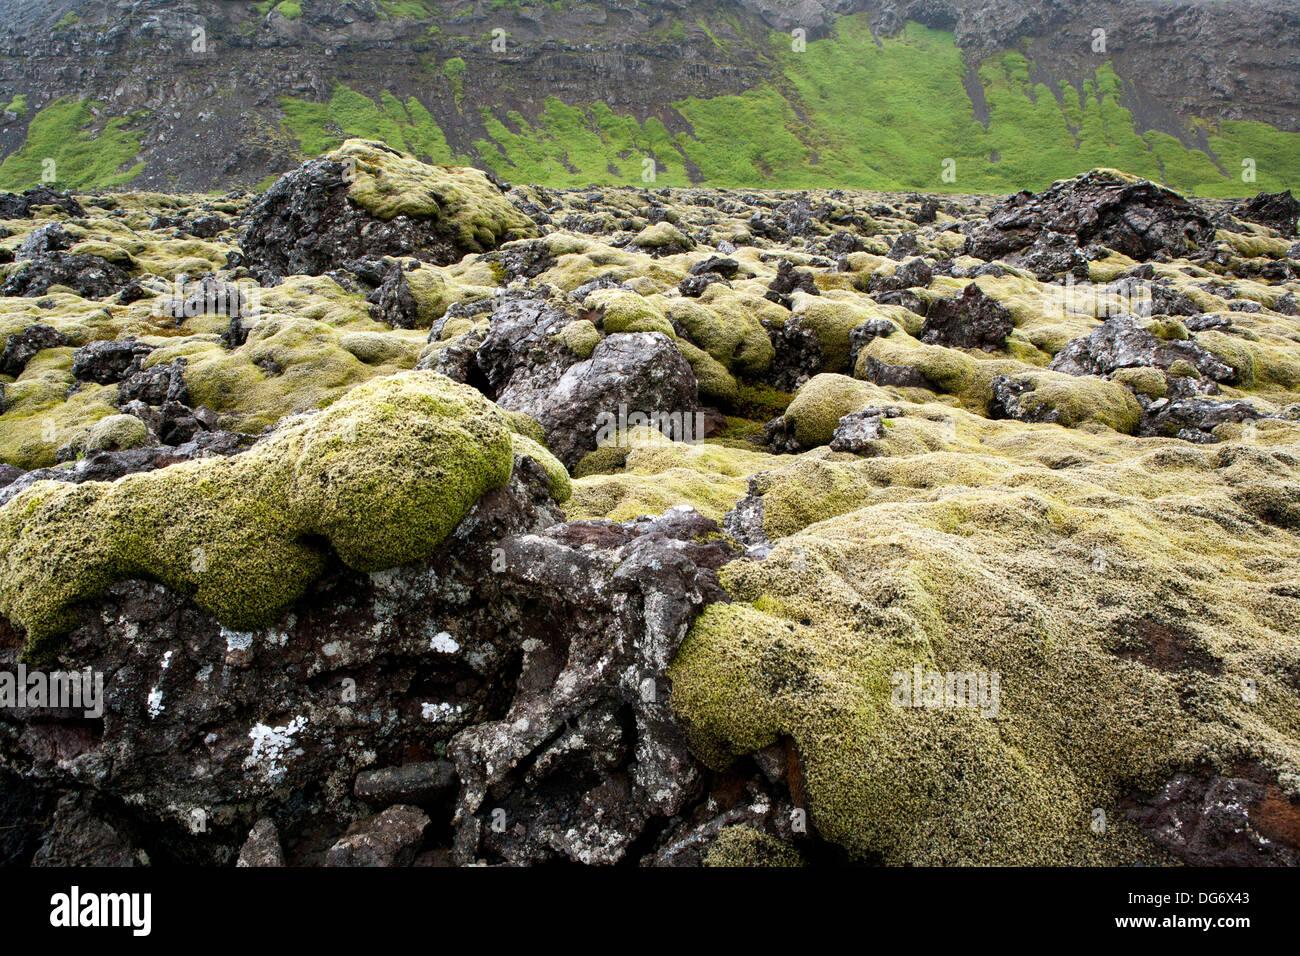 Moss covered lava fields - Reykjanes Peninsula, Southwest Iceland - Stock Image